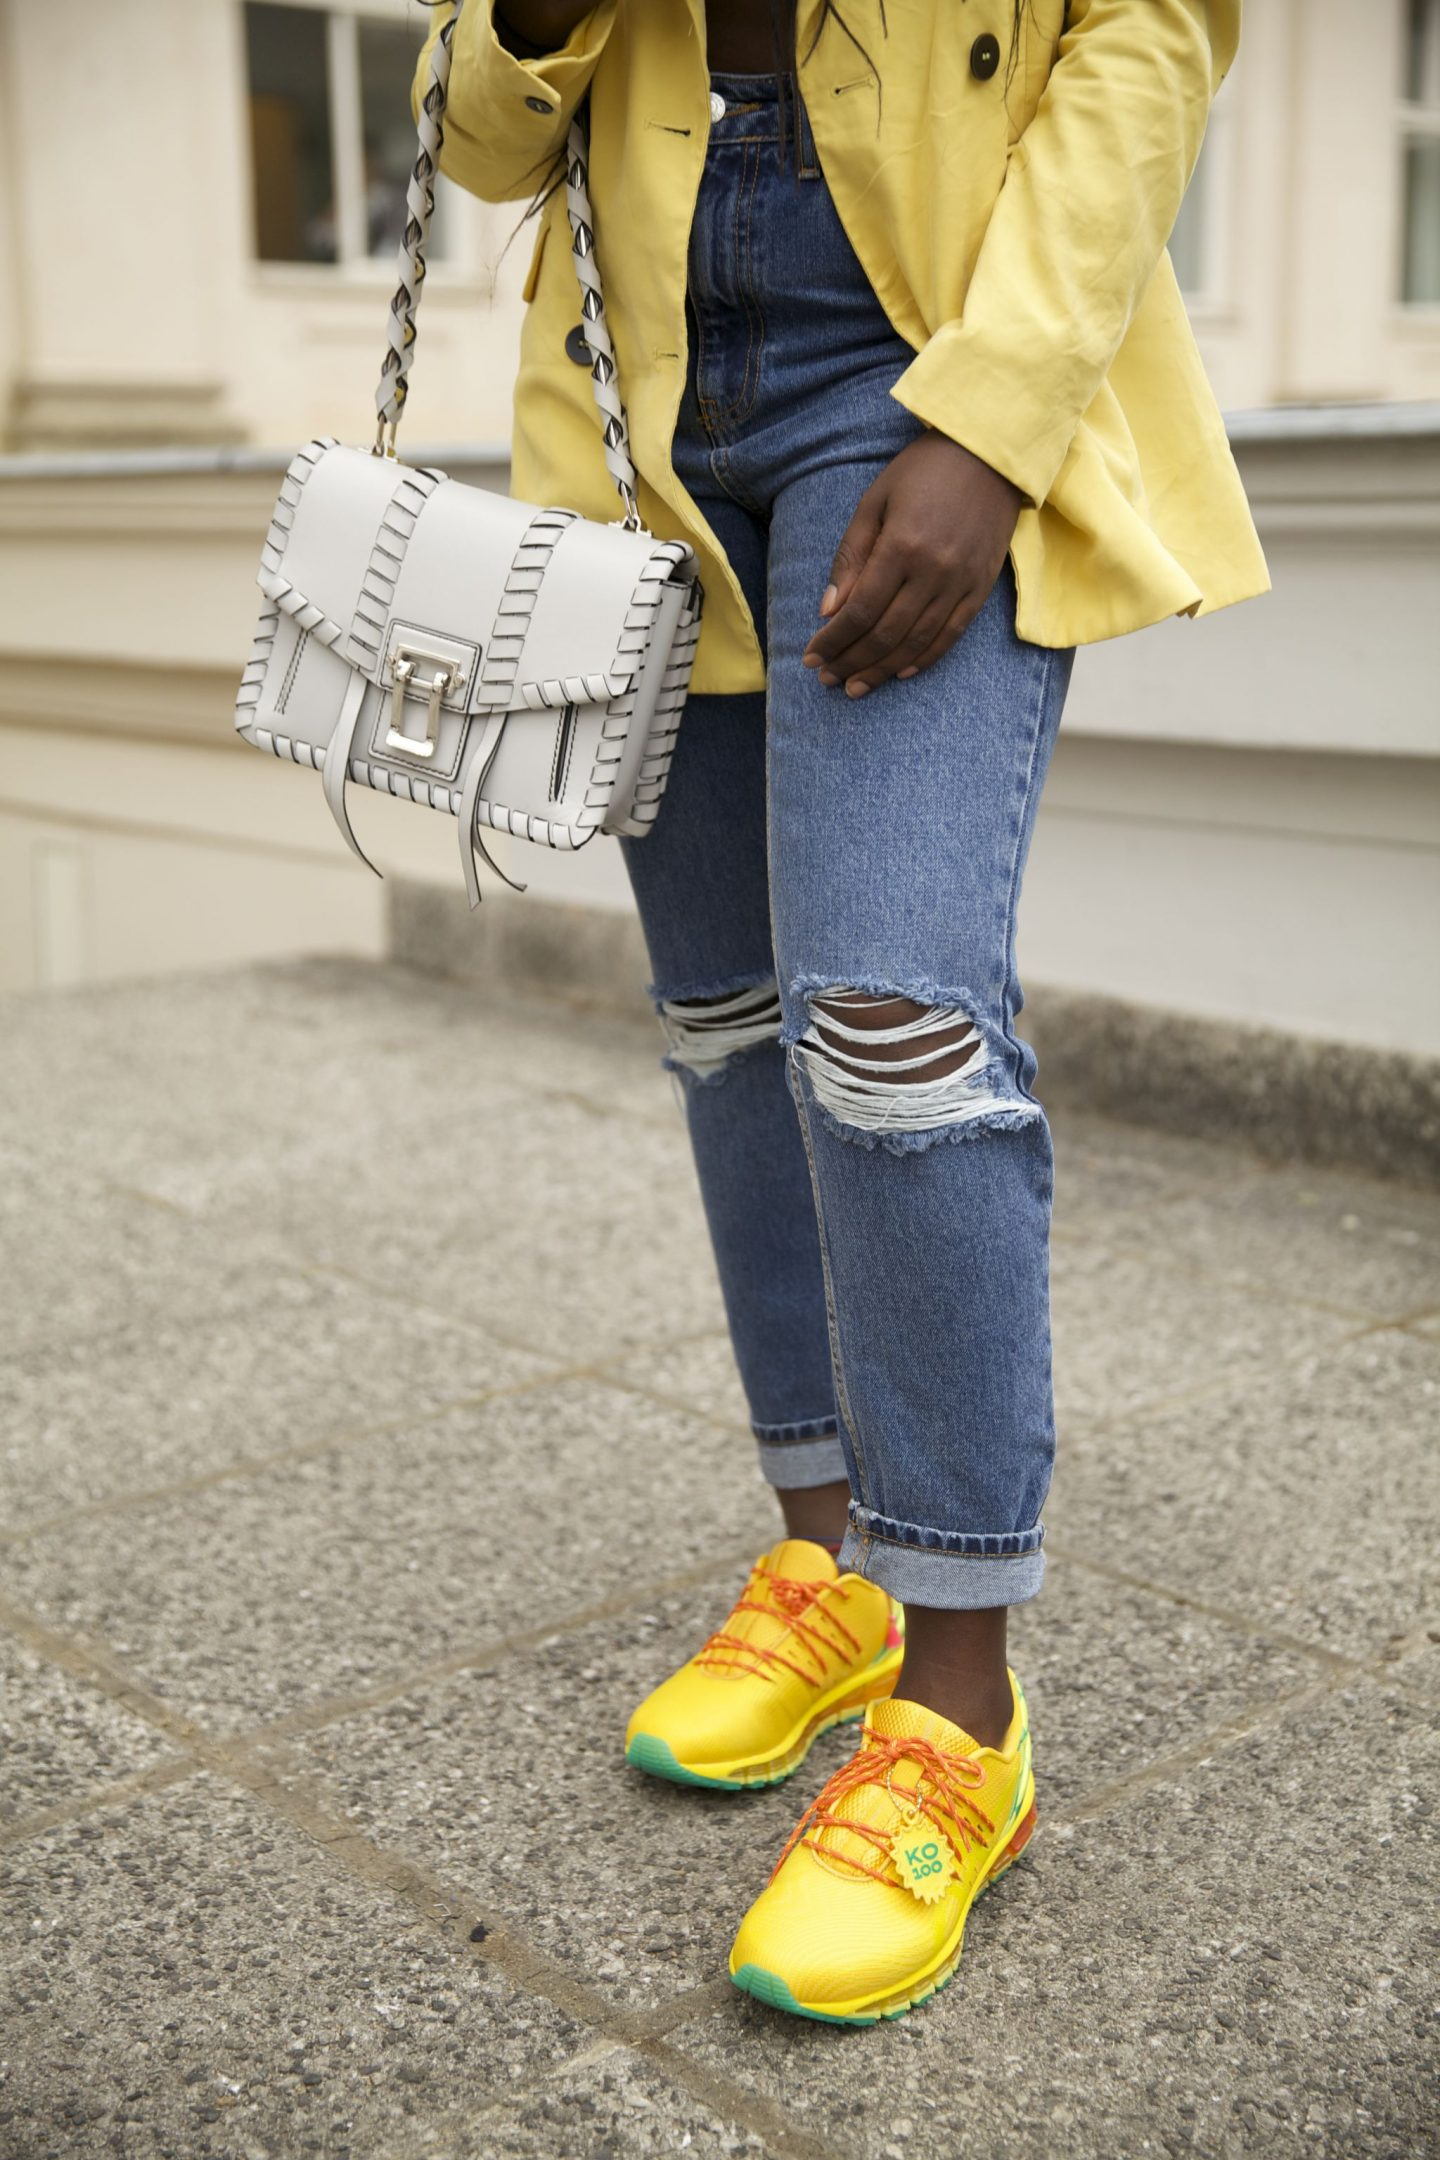 Asics gel ko100 sunflower edition sneakers lois opoku proenza schouler hava whipstitch bag street style lisforlois_2